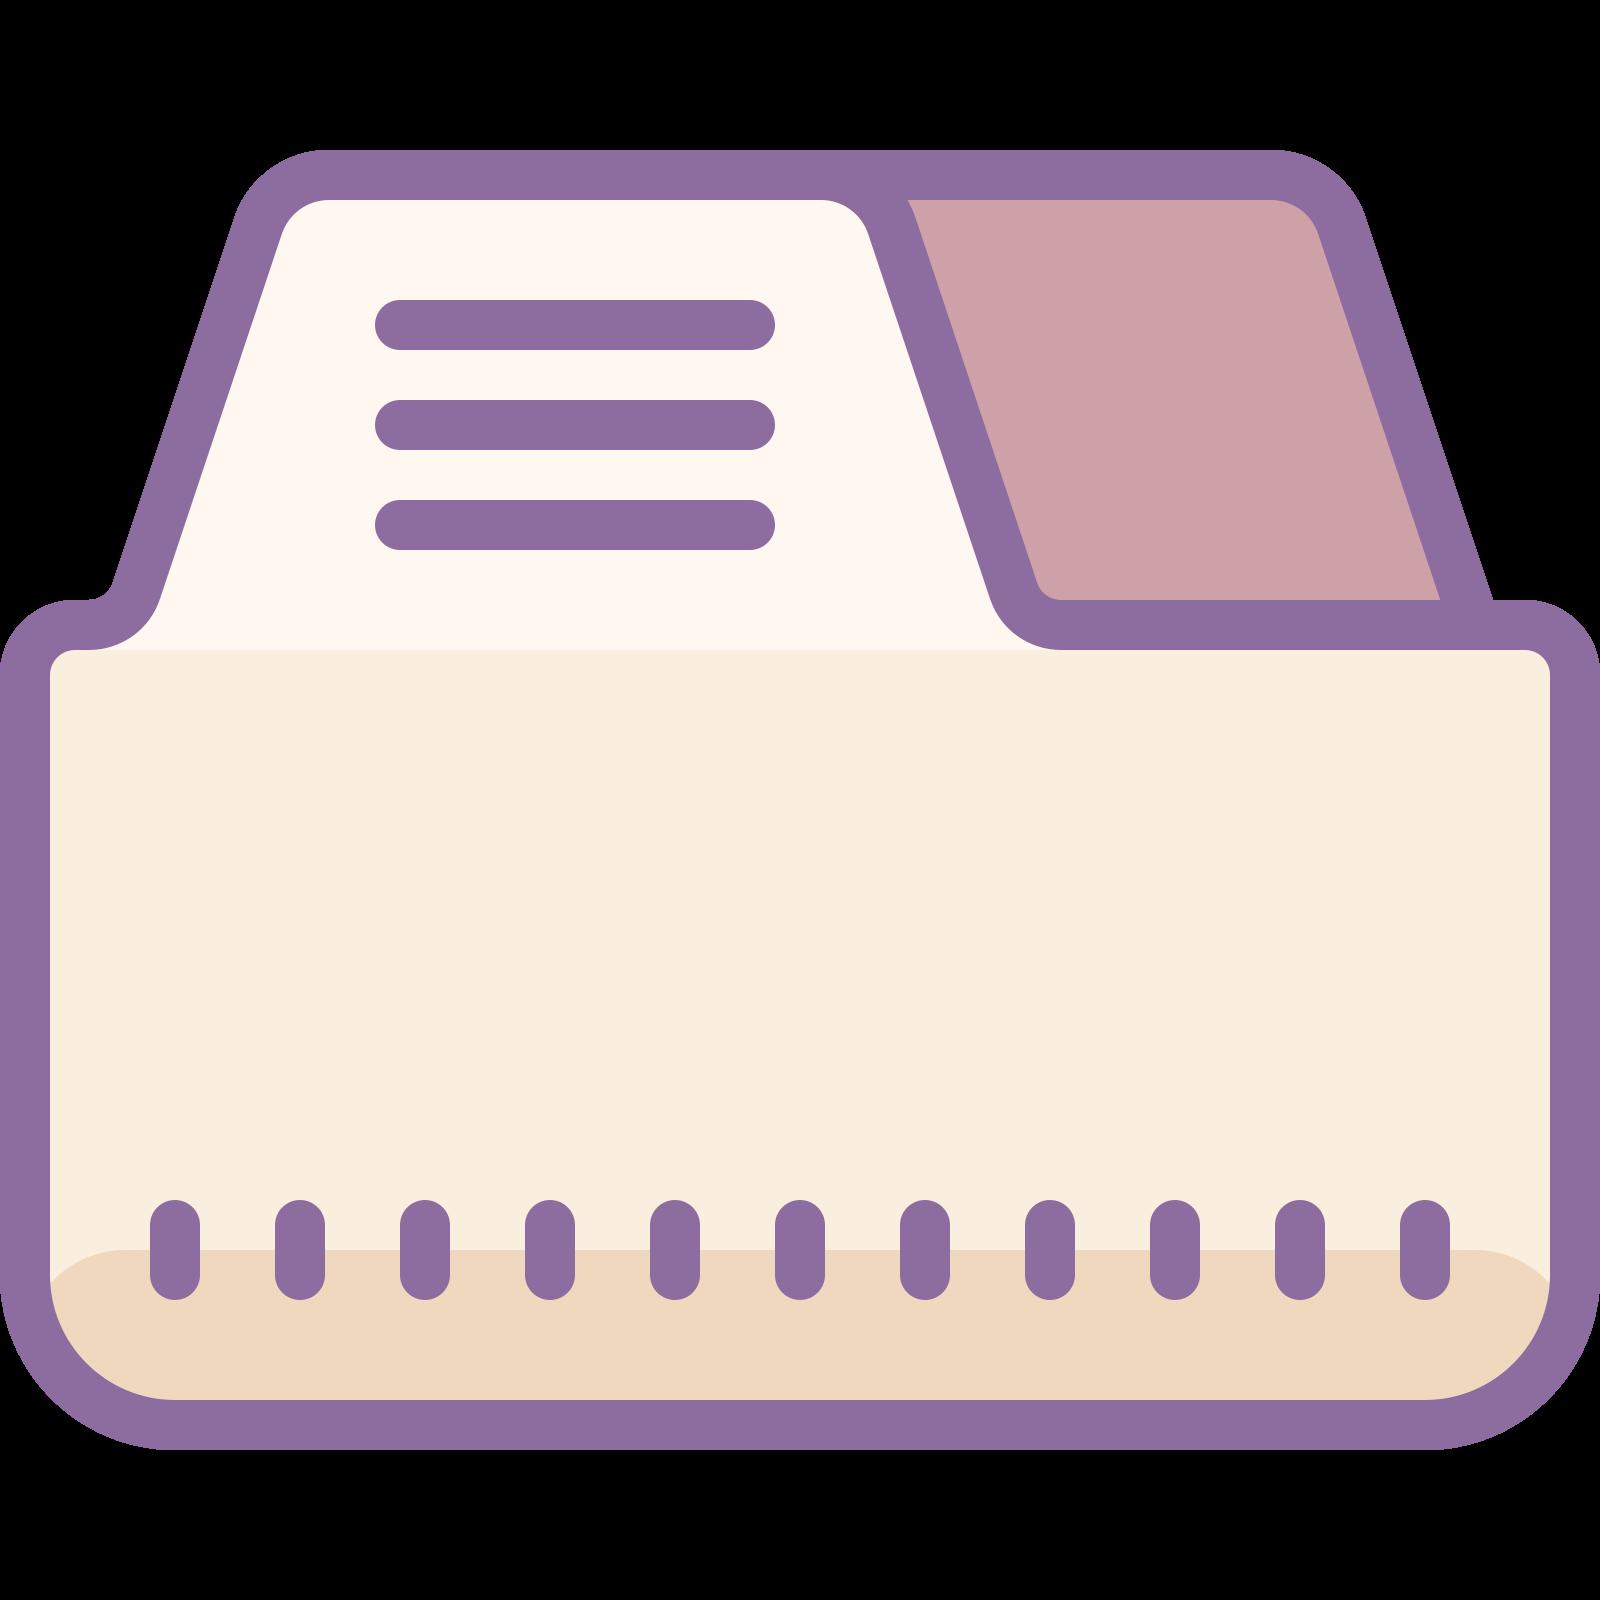 Dodatkowe funkcje icon